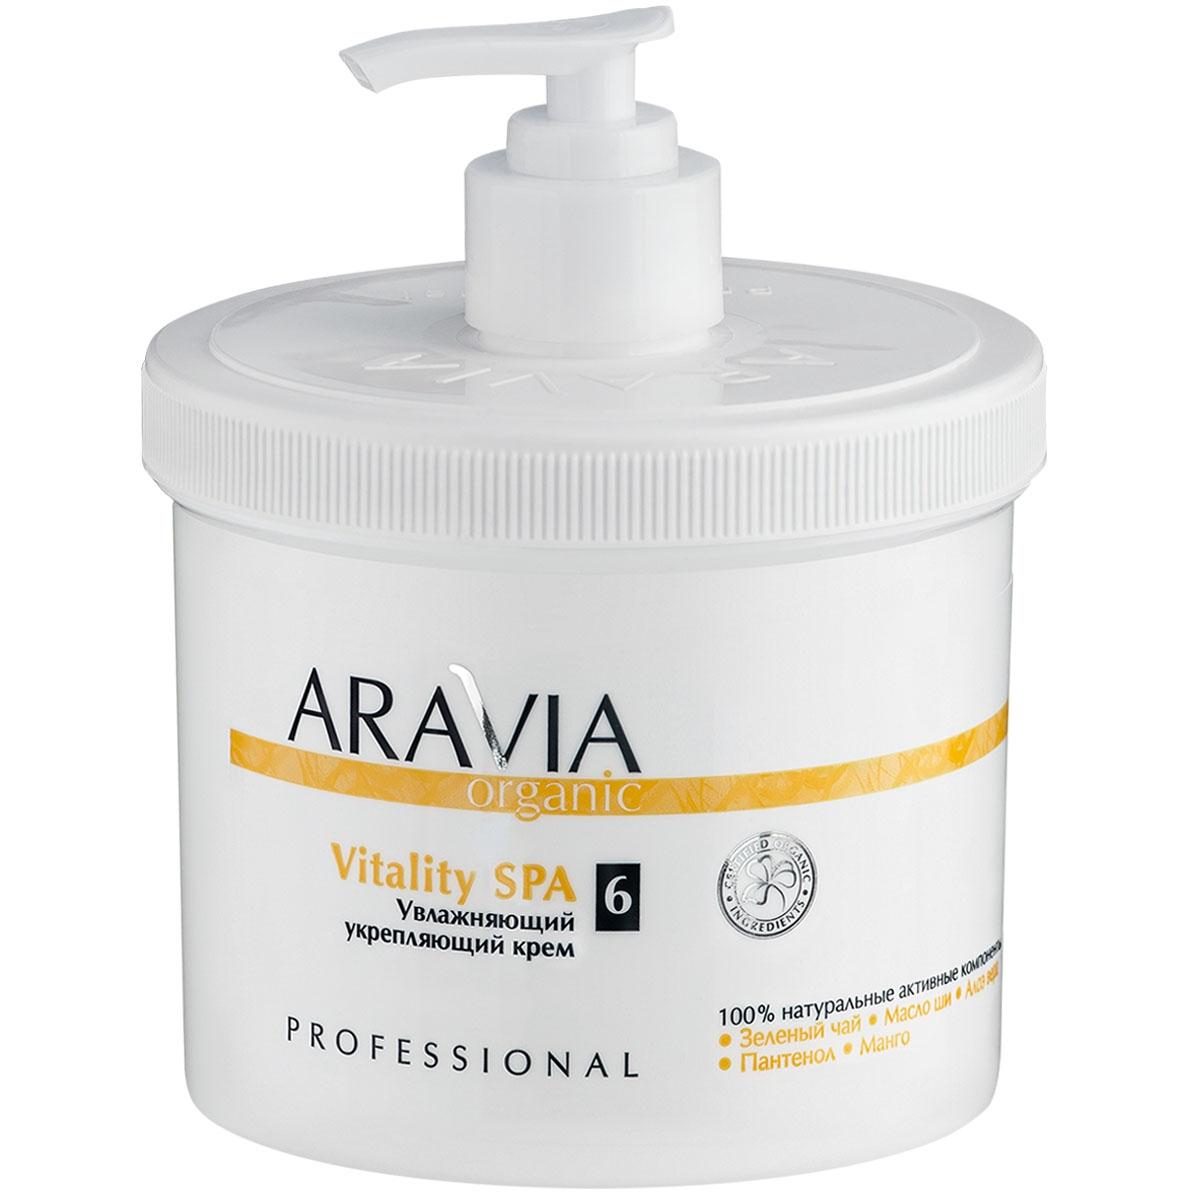 ARAVIA Organic Увлажняющий Укрепляющий Крем «Vitality SPA», 550 мл